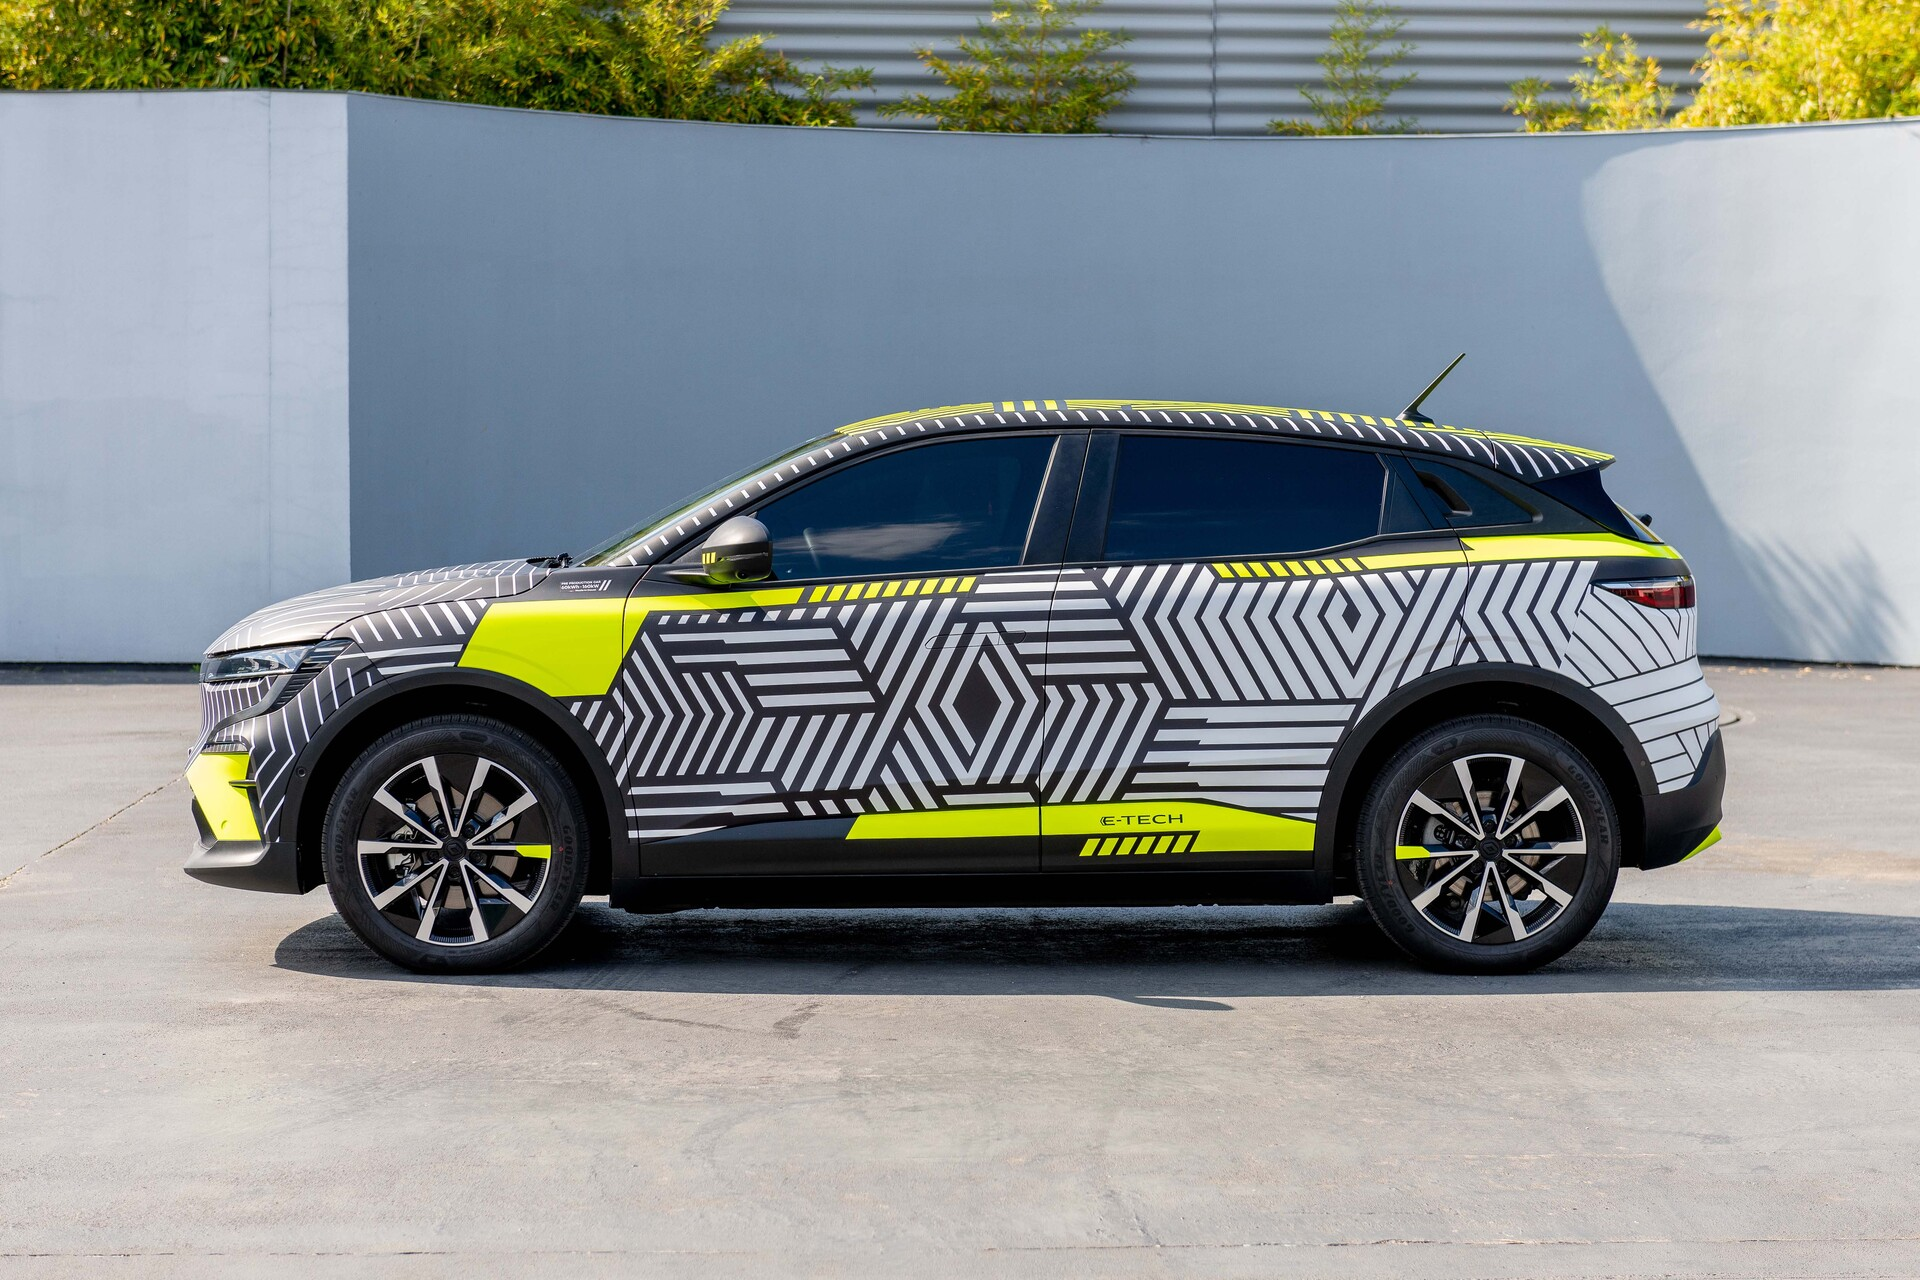 2021 New Renault Megane Etech Electric Preproduction 4